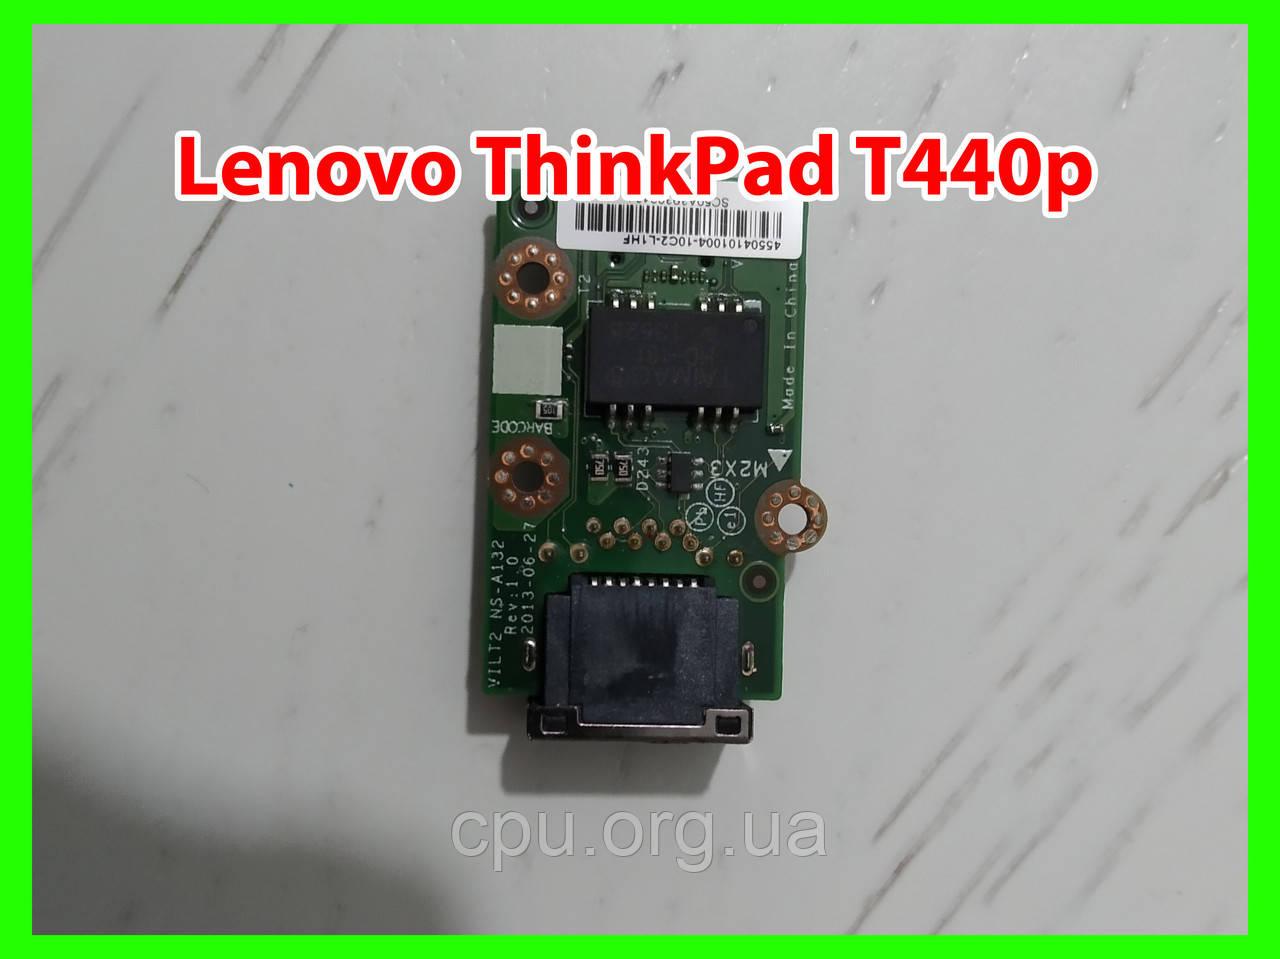 Плата сети lan port Lenovo ThinkPad T440p